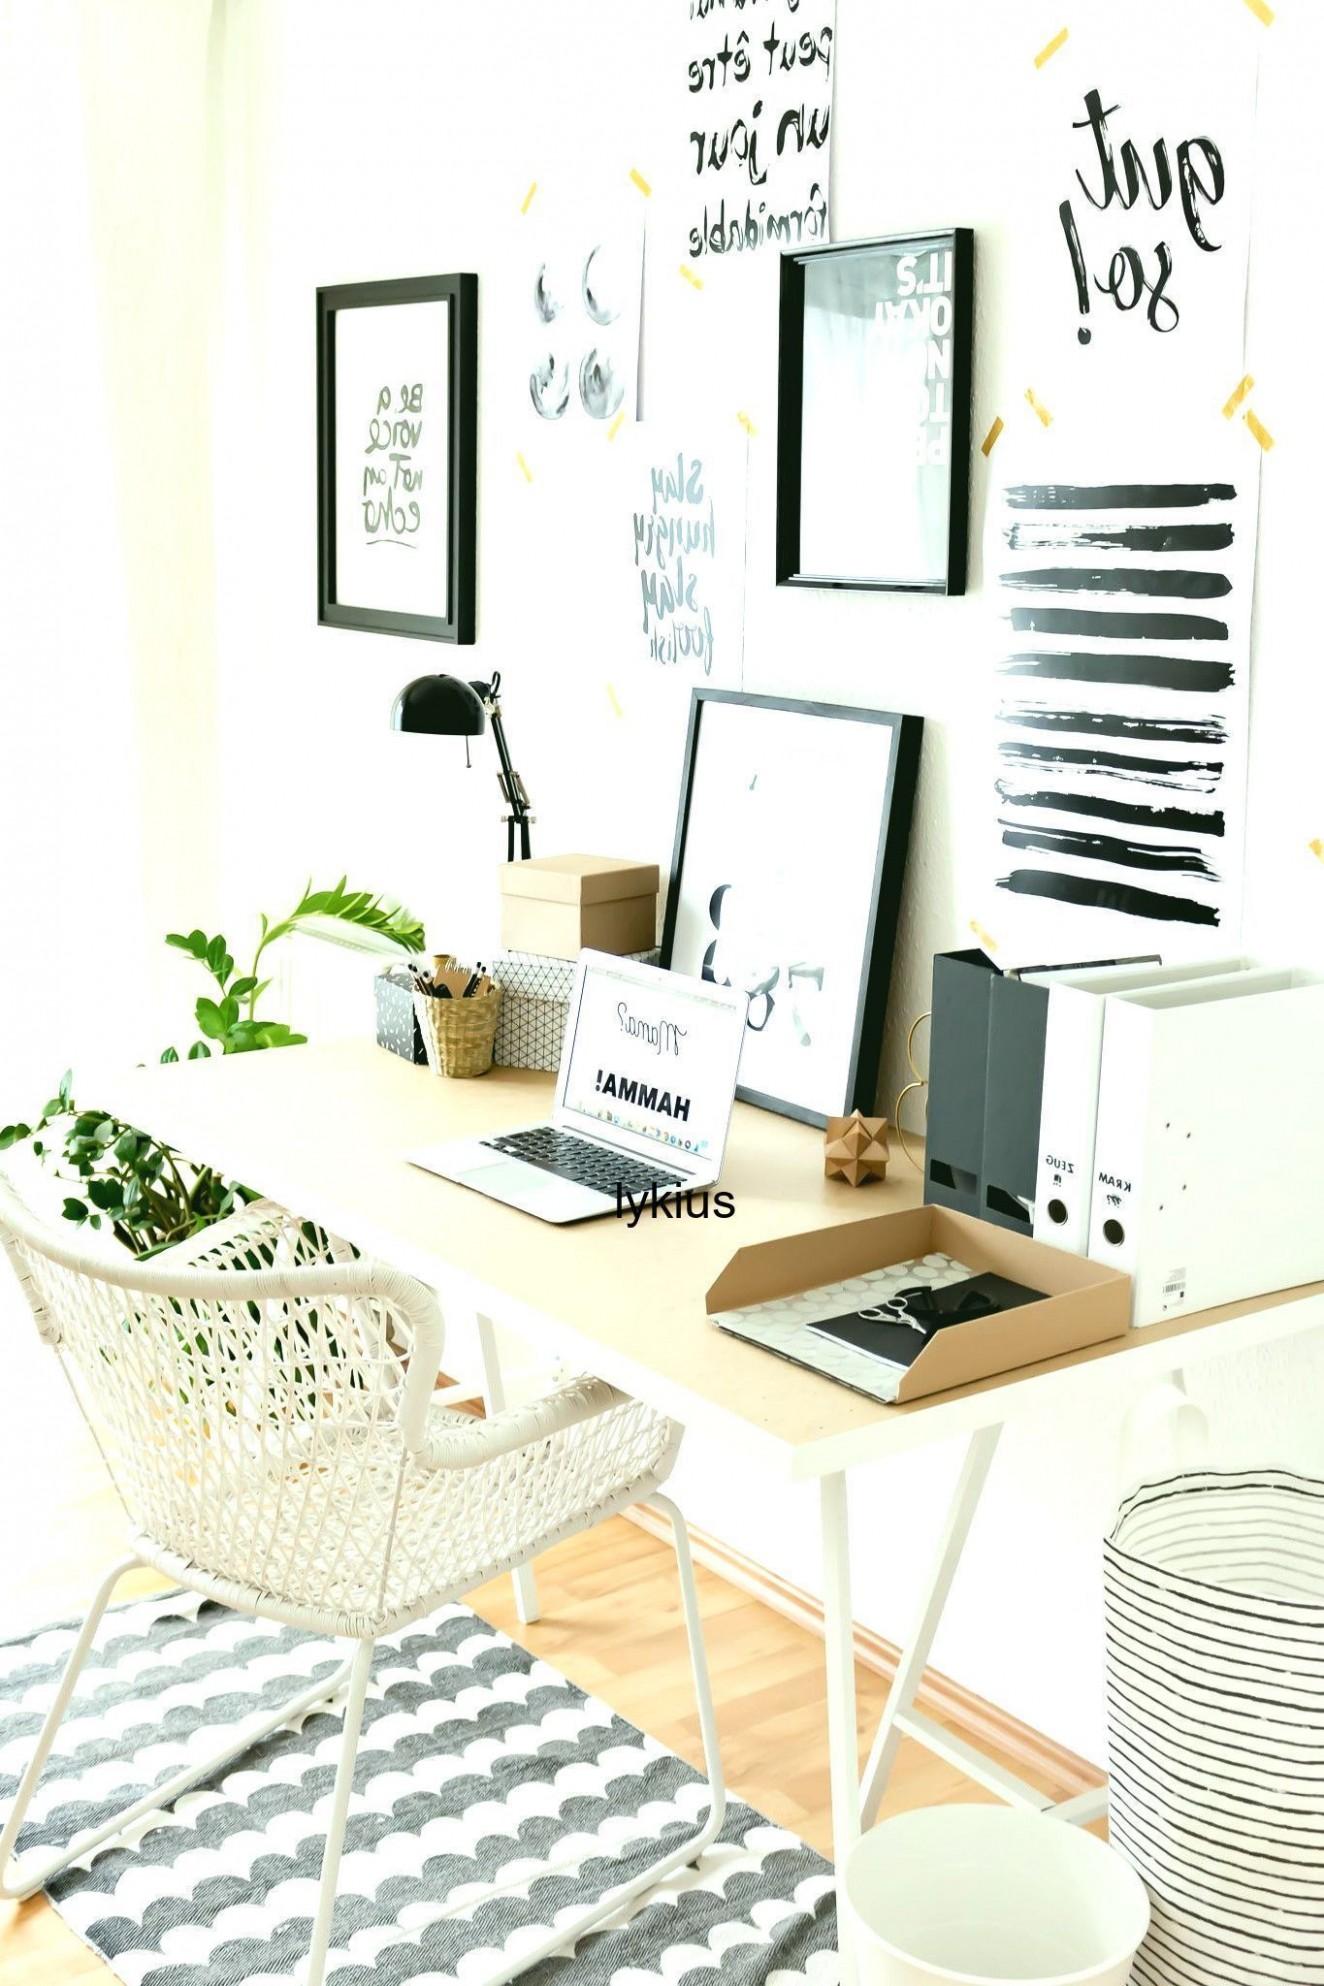 Wohnkultur kmart Wohnkultur homedecor #homedecor Arbeiten im Home  - Home Office Ideas Kmart